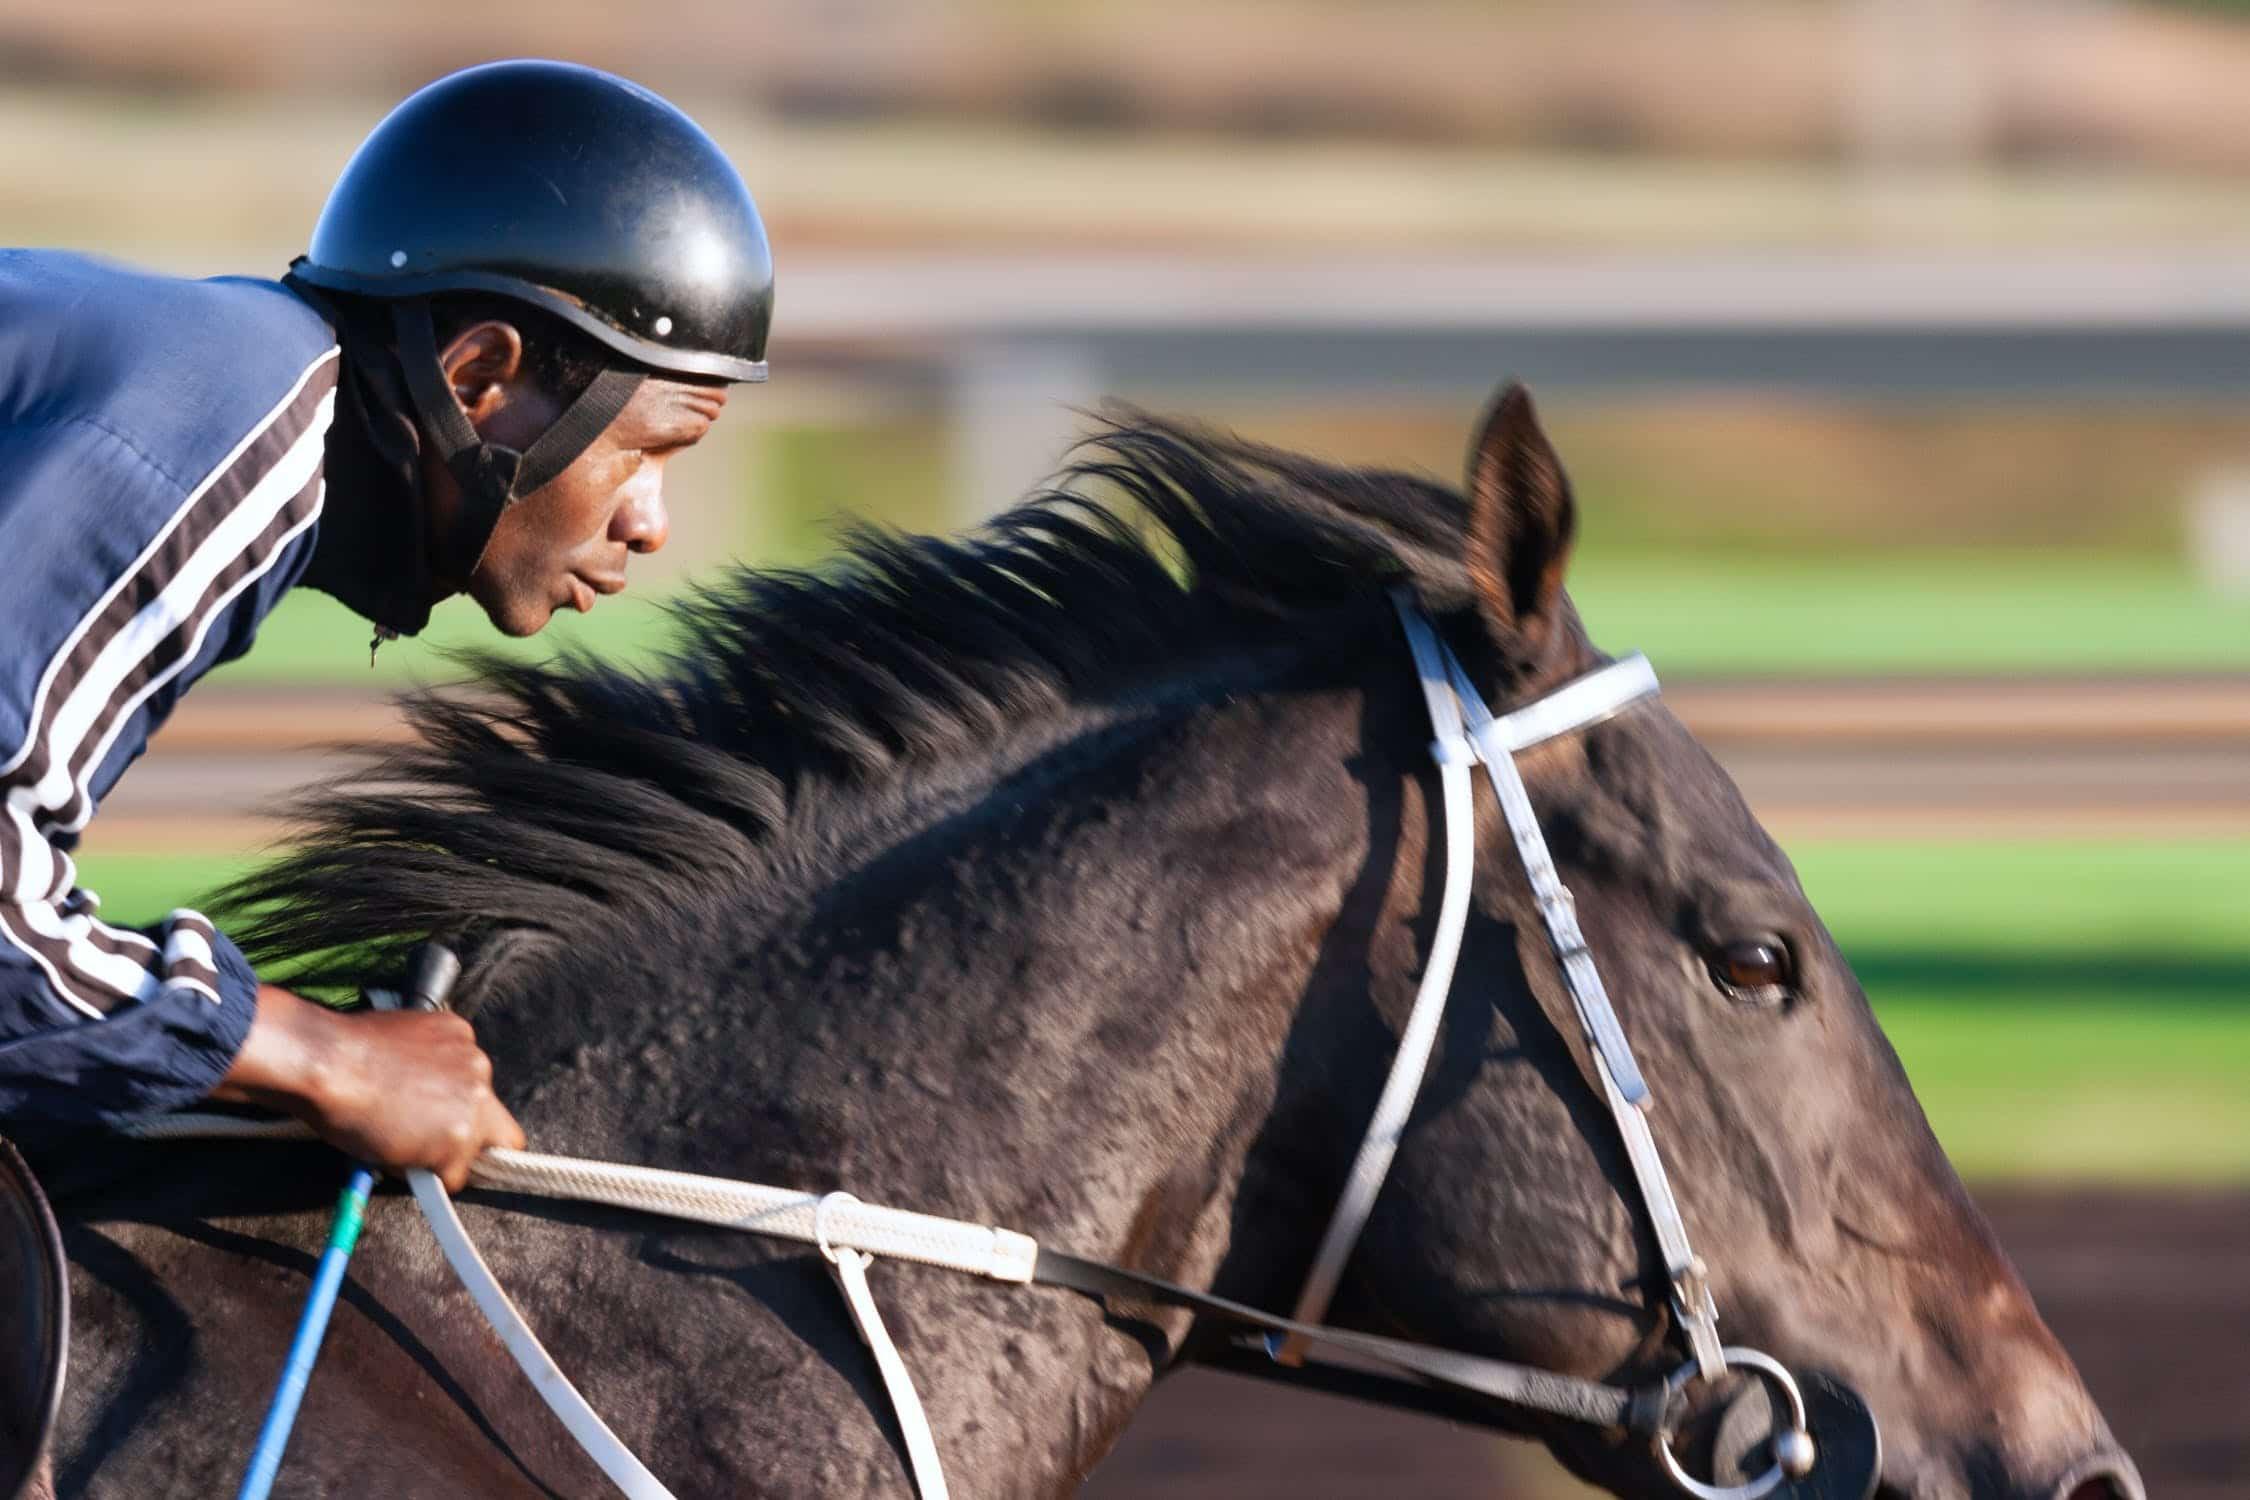 Horse rider racing